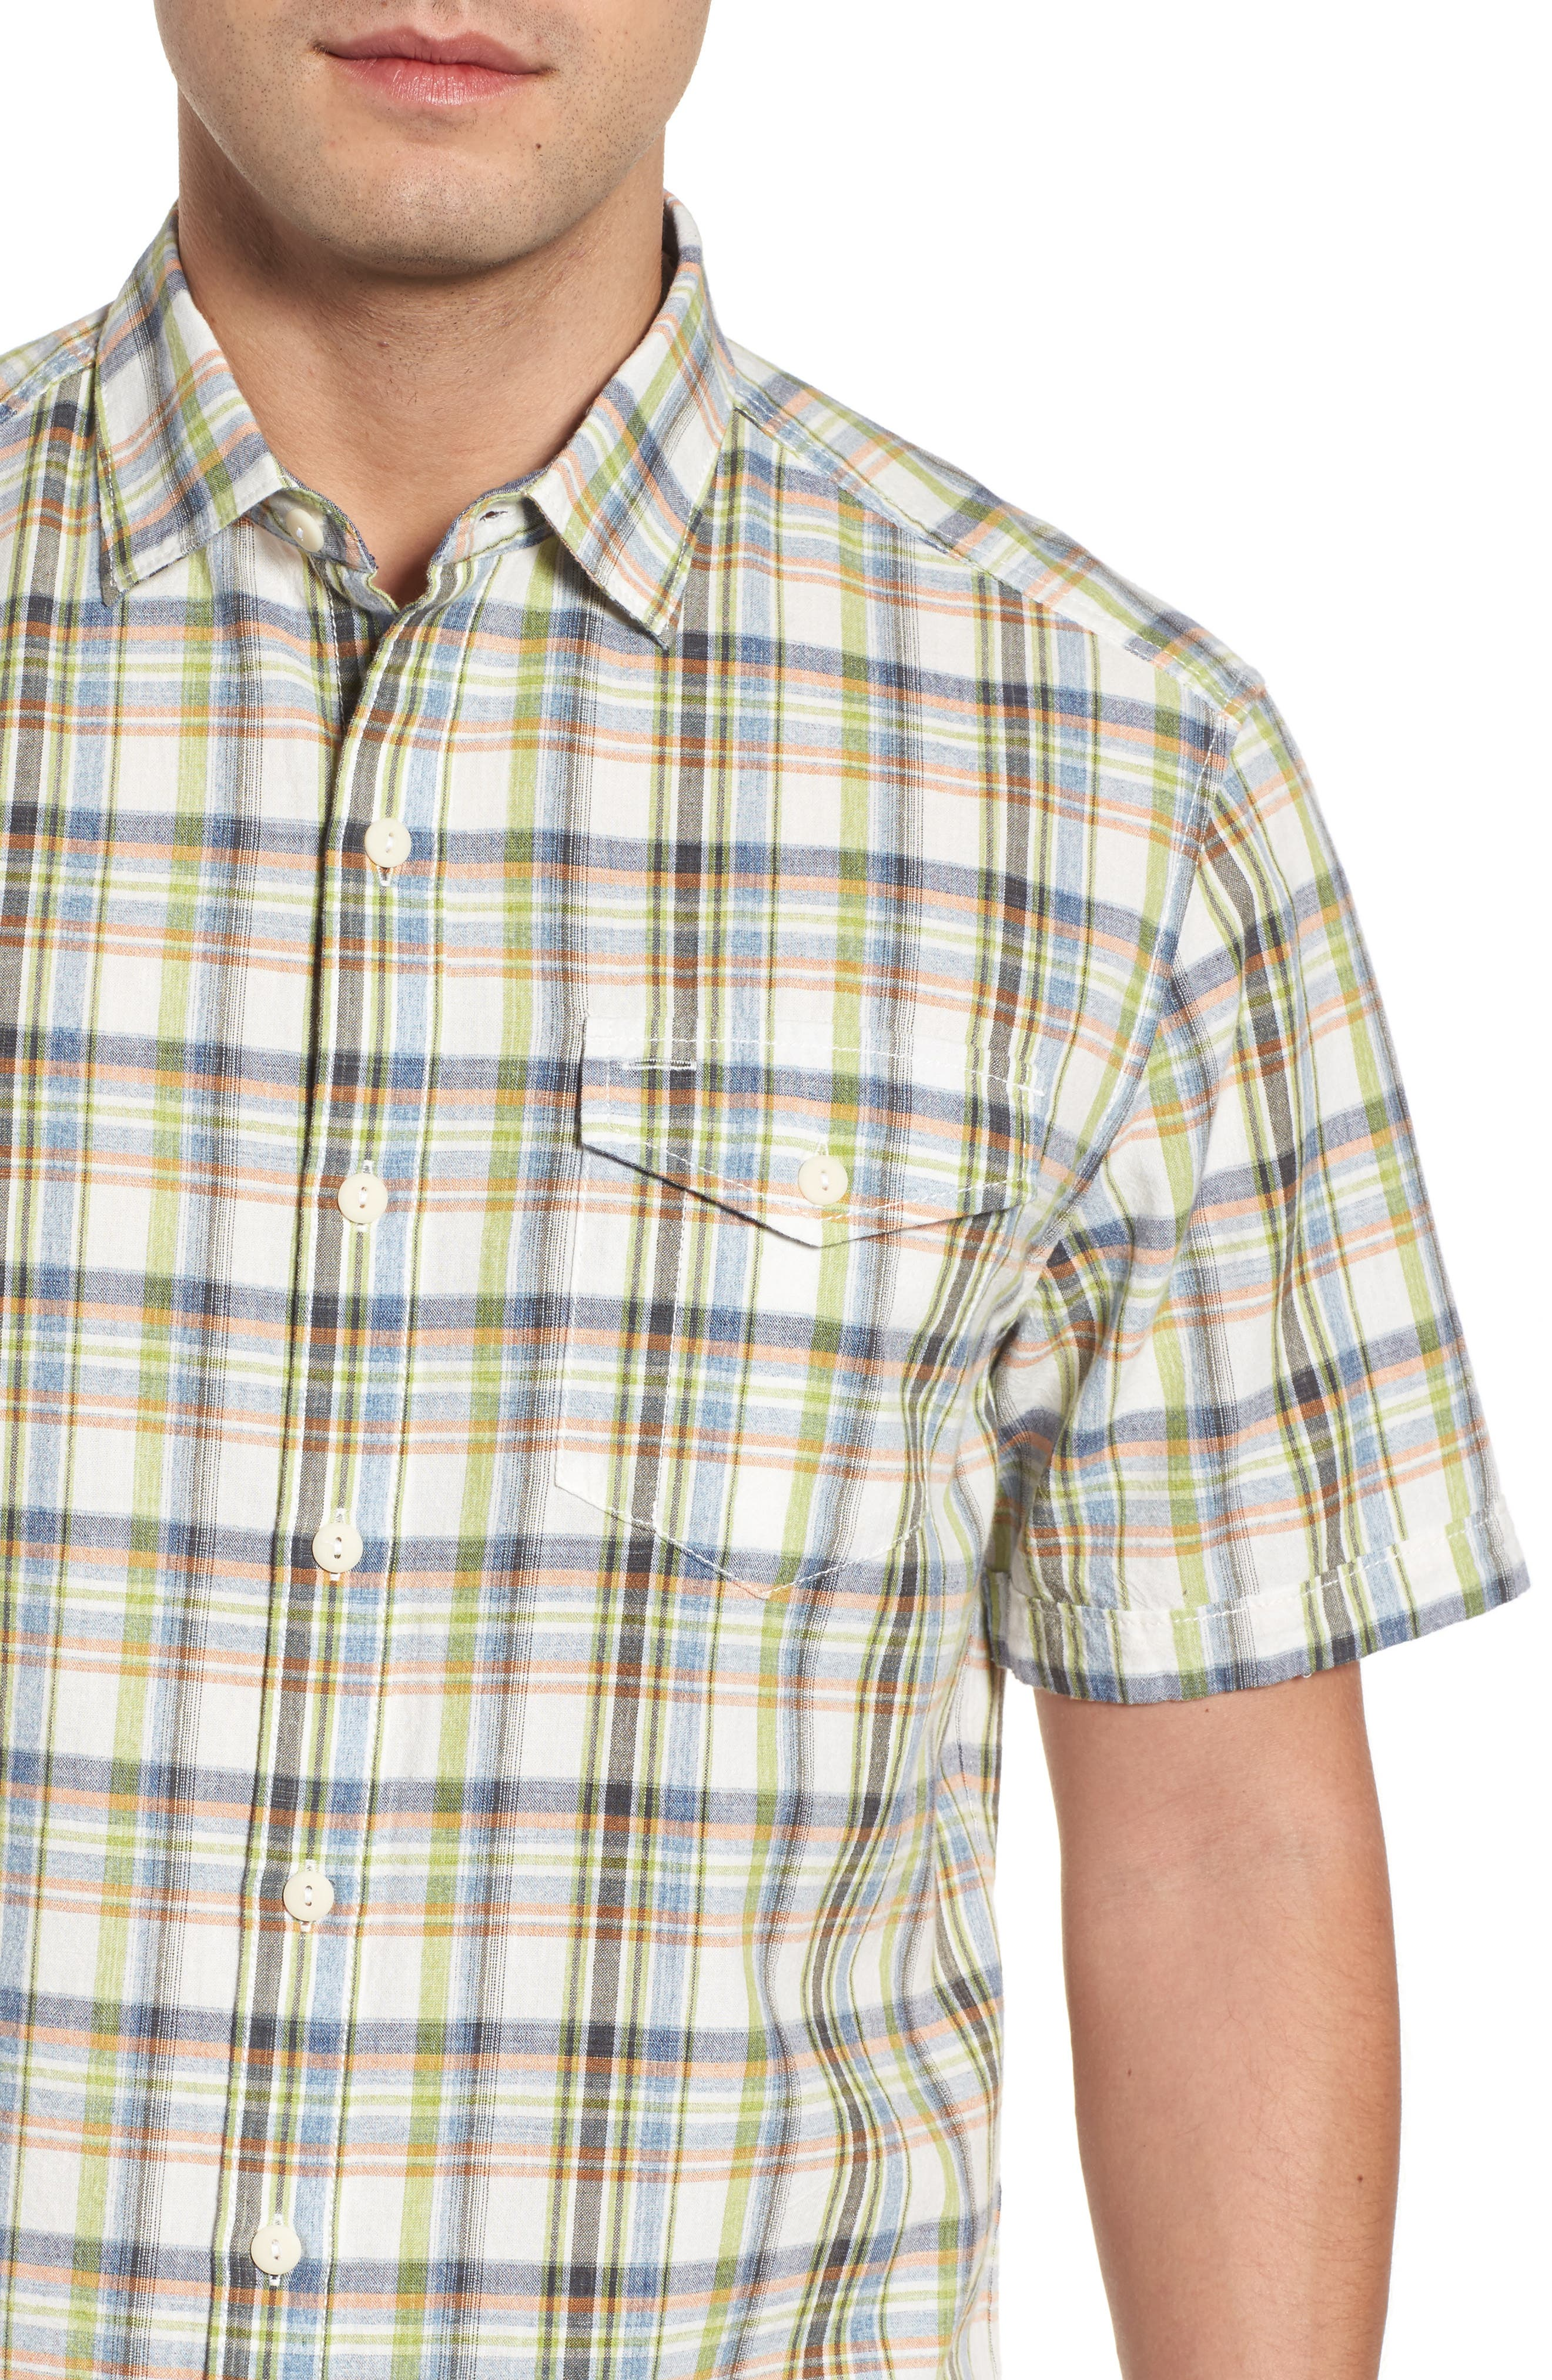 Ocean Cay Plaid Sport Shirt,                             Alternate thumbnail 4, color,                             Tart Apple